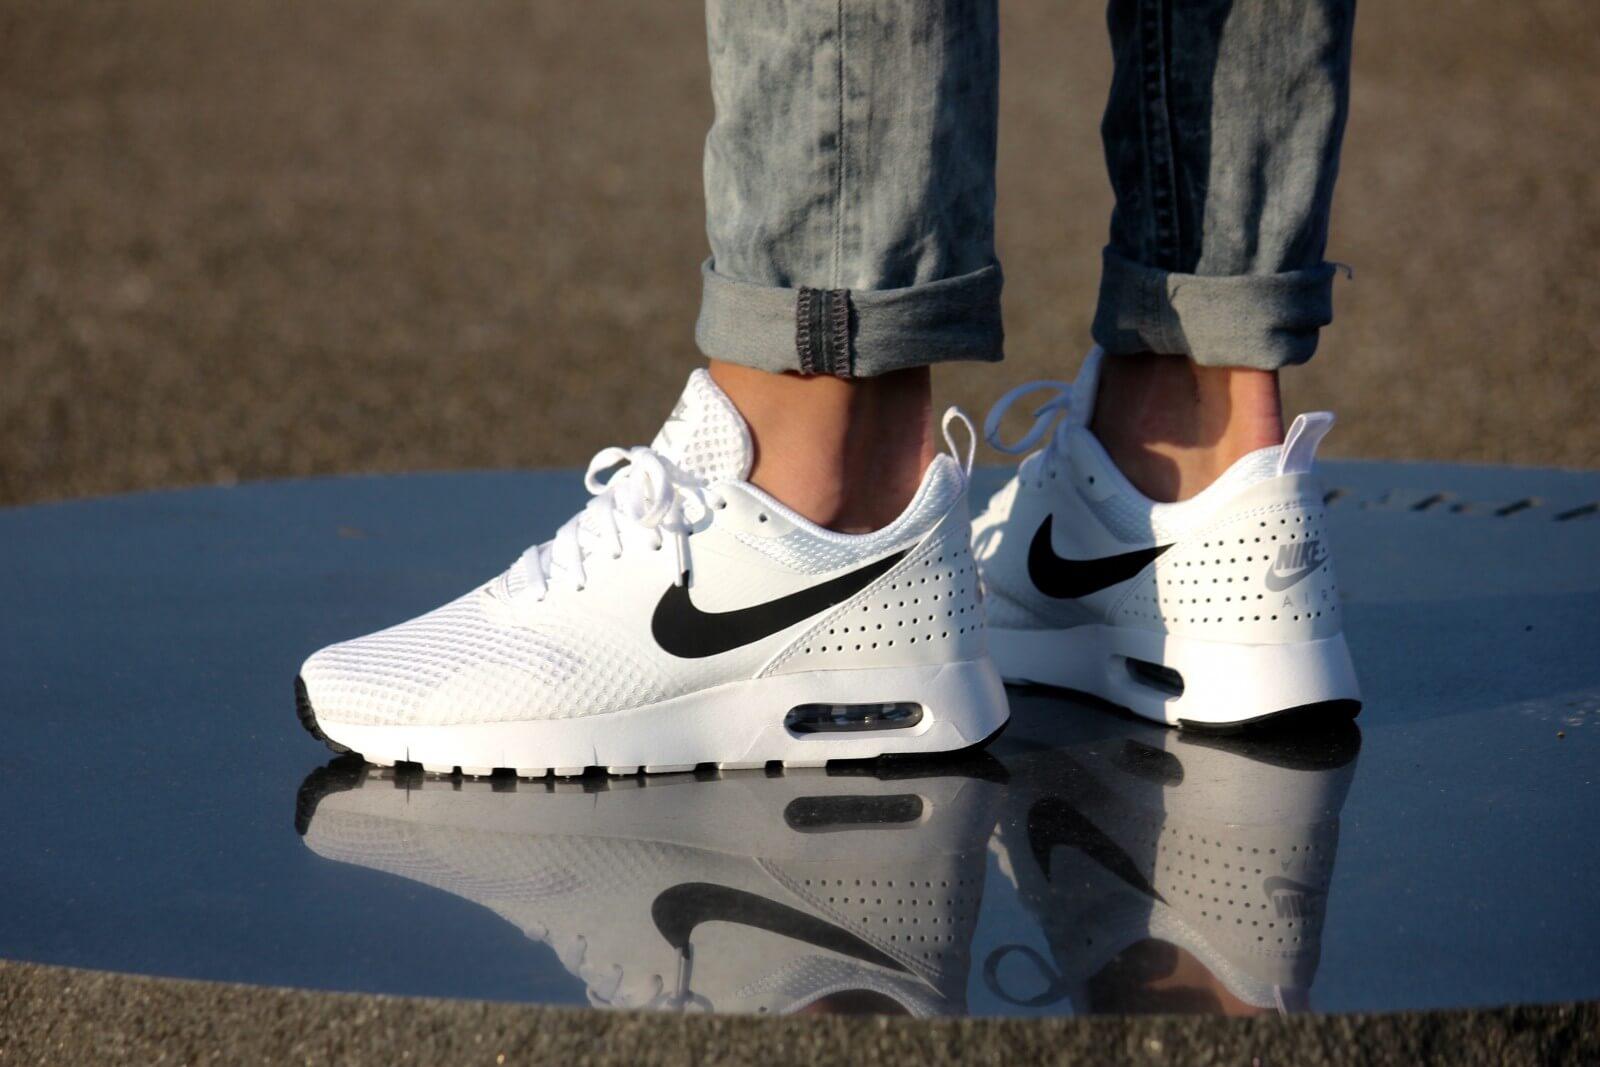 Nike Air Max Tavas BR GS White/ Black